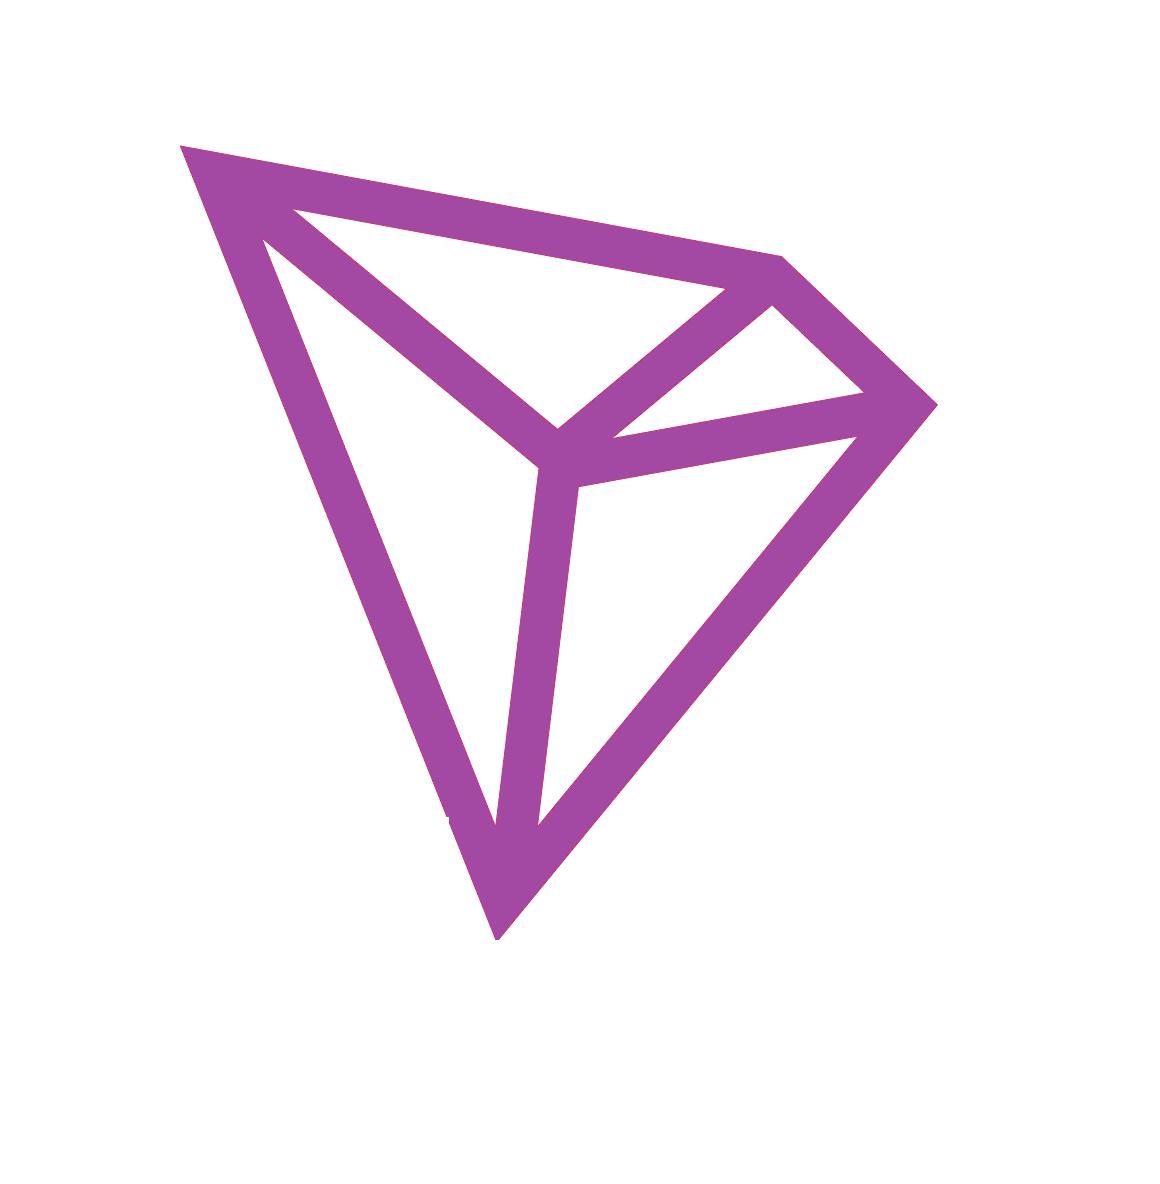 Tron Ultra logo